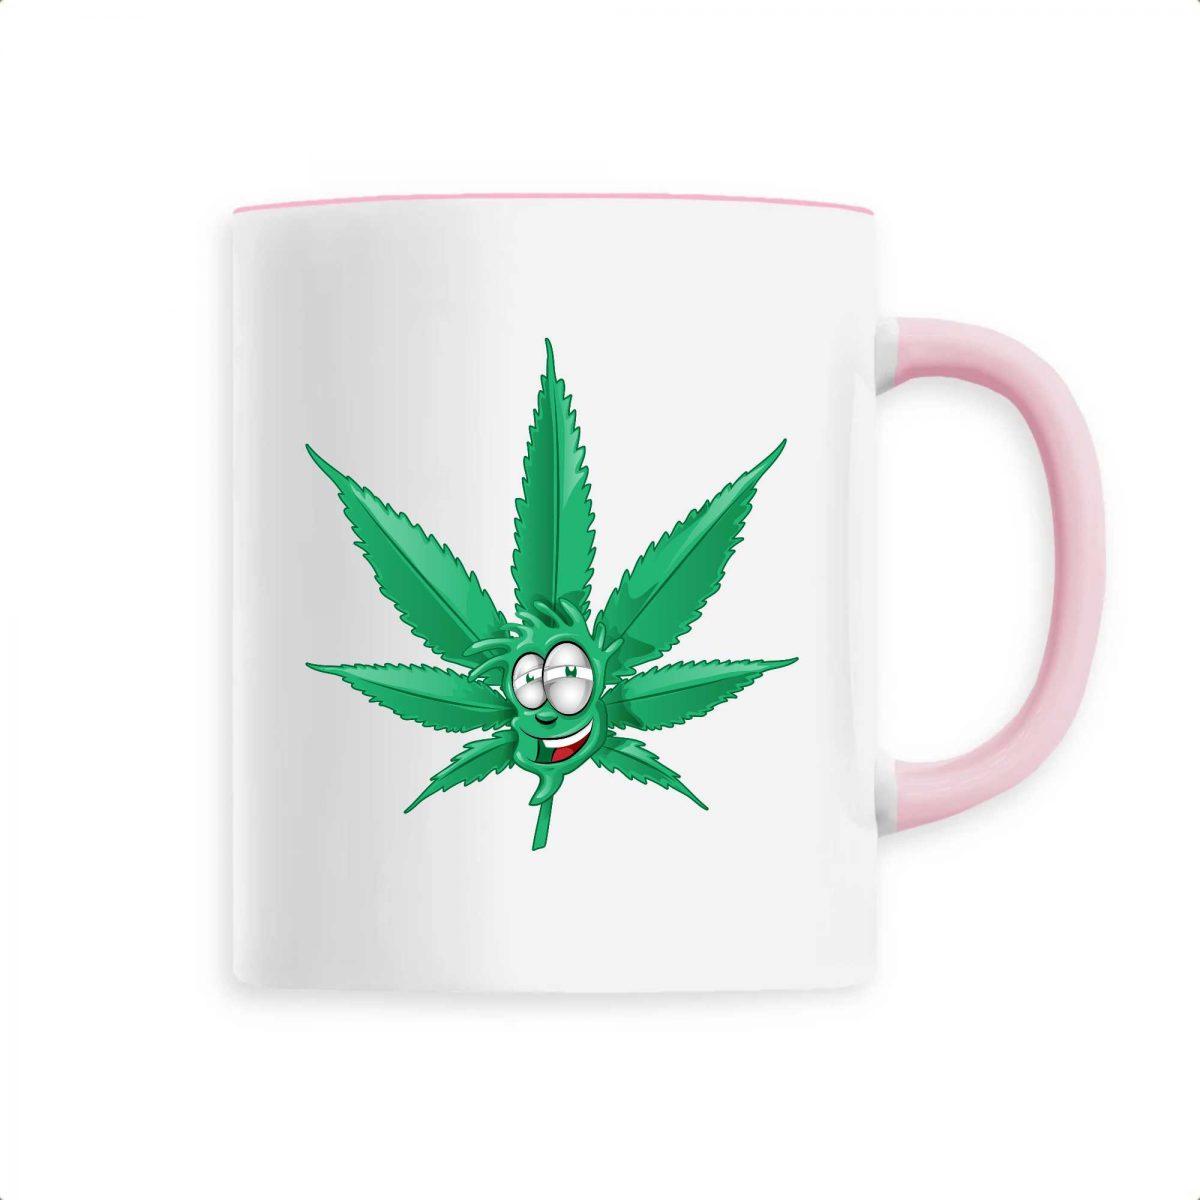 Mug Made In Chanvre - Feuille de Cannabis